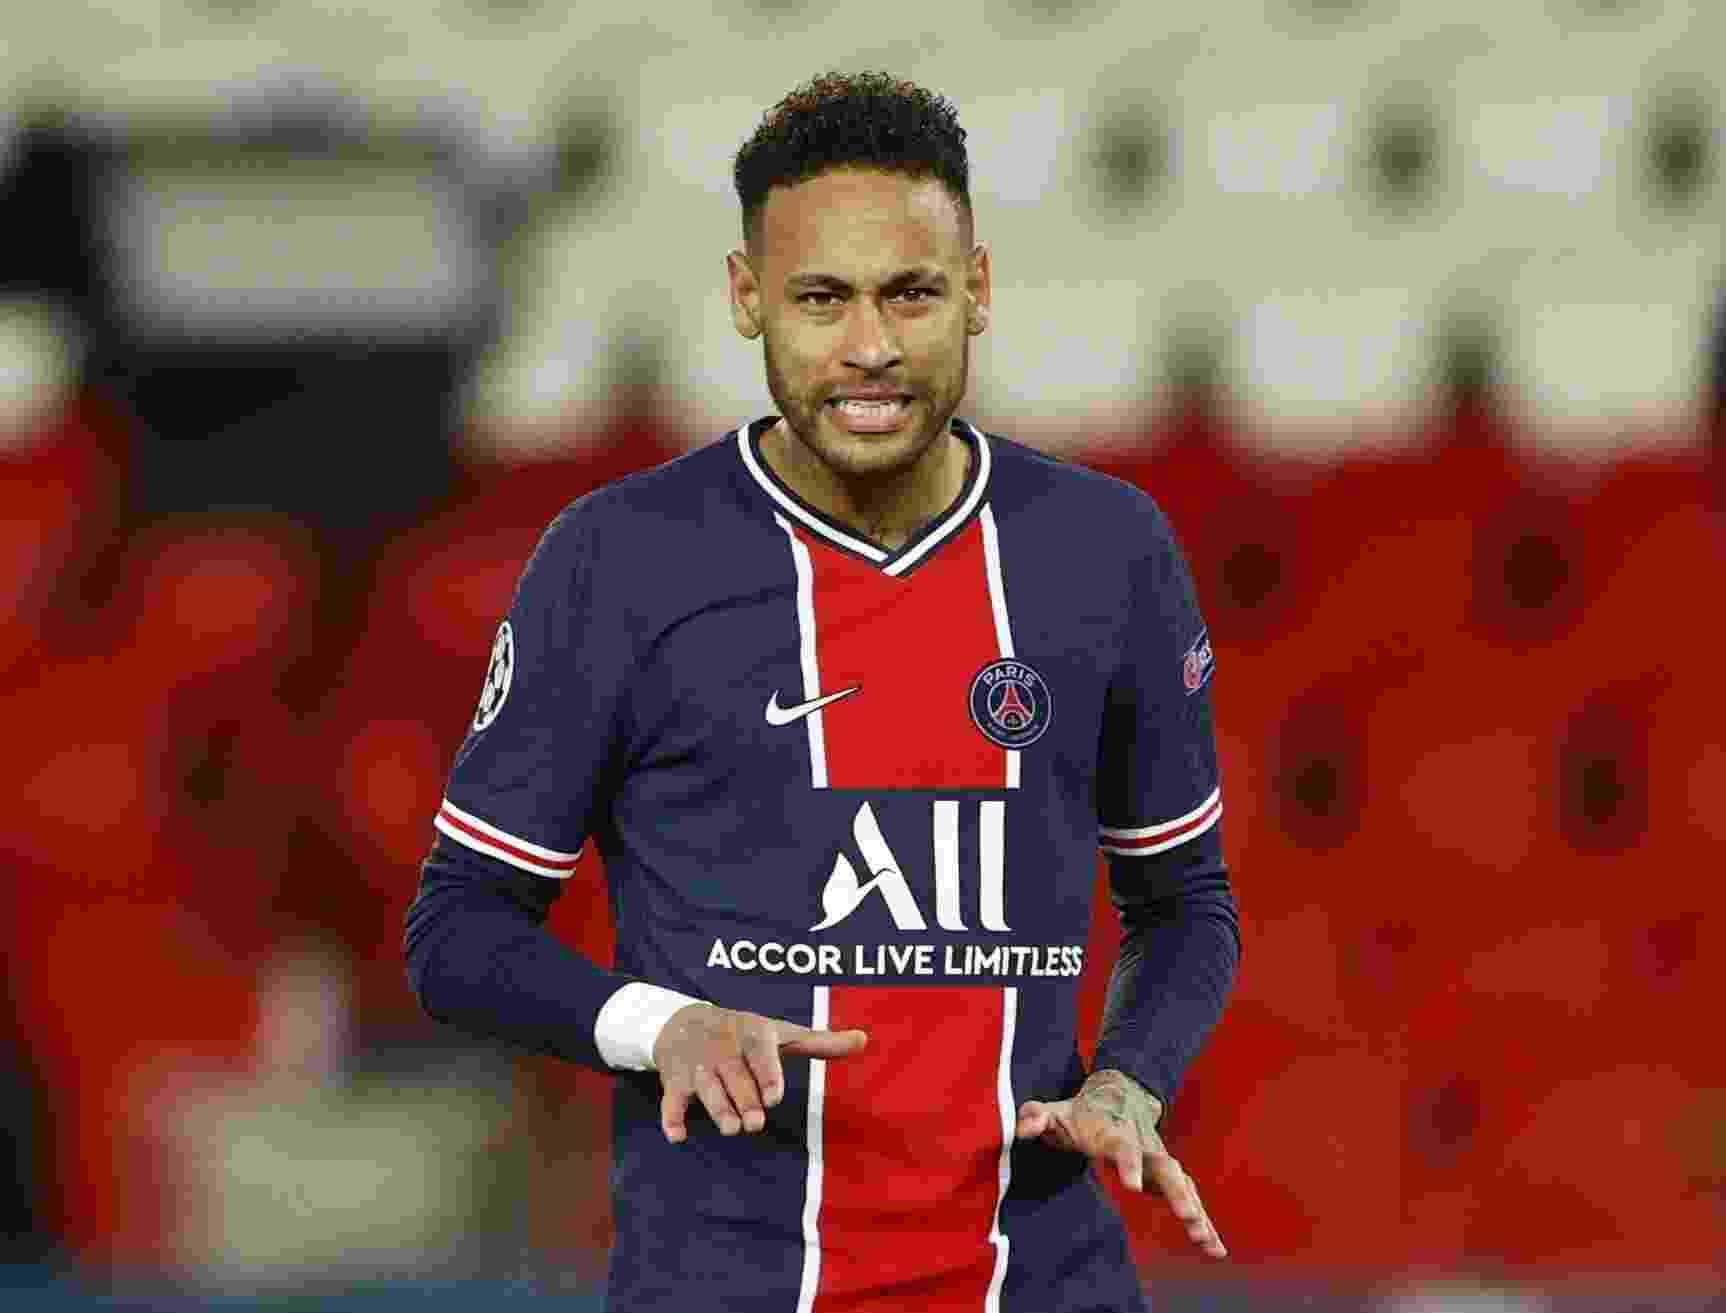 Neymar durante PSG x Bayern, pela Liga dos Campeões - CHRISTIAN HARTMANN/REUTERS